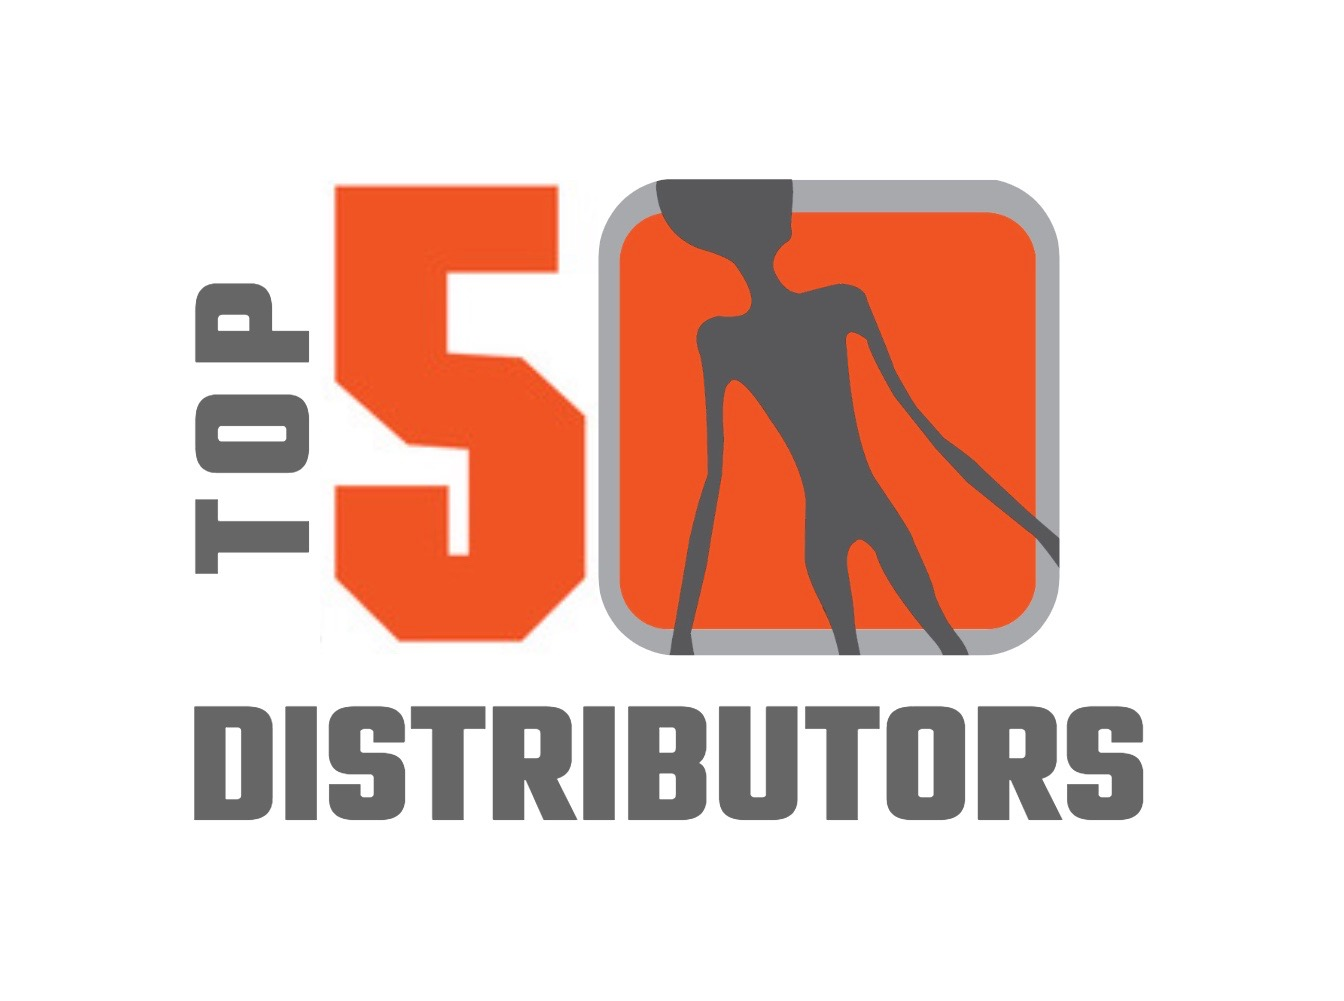 2017 TOP 50 Electronics Distributors - Area51 2.jpg